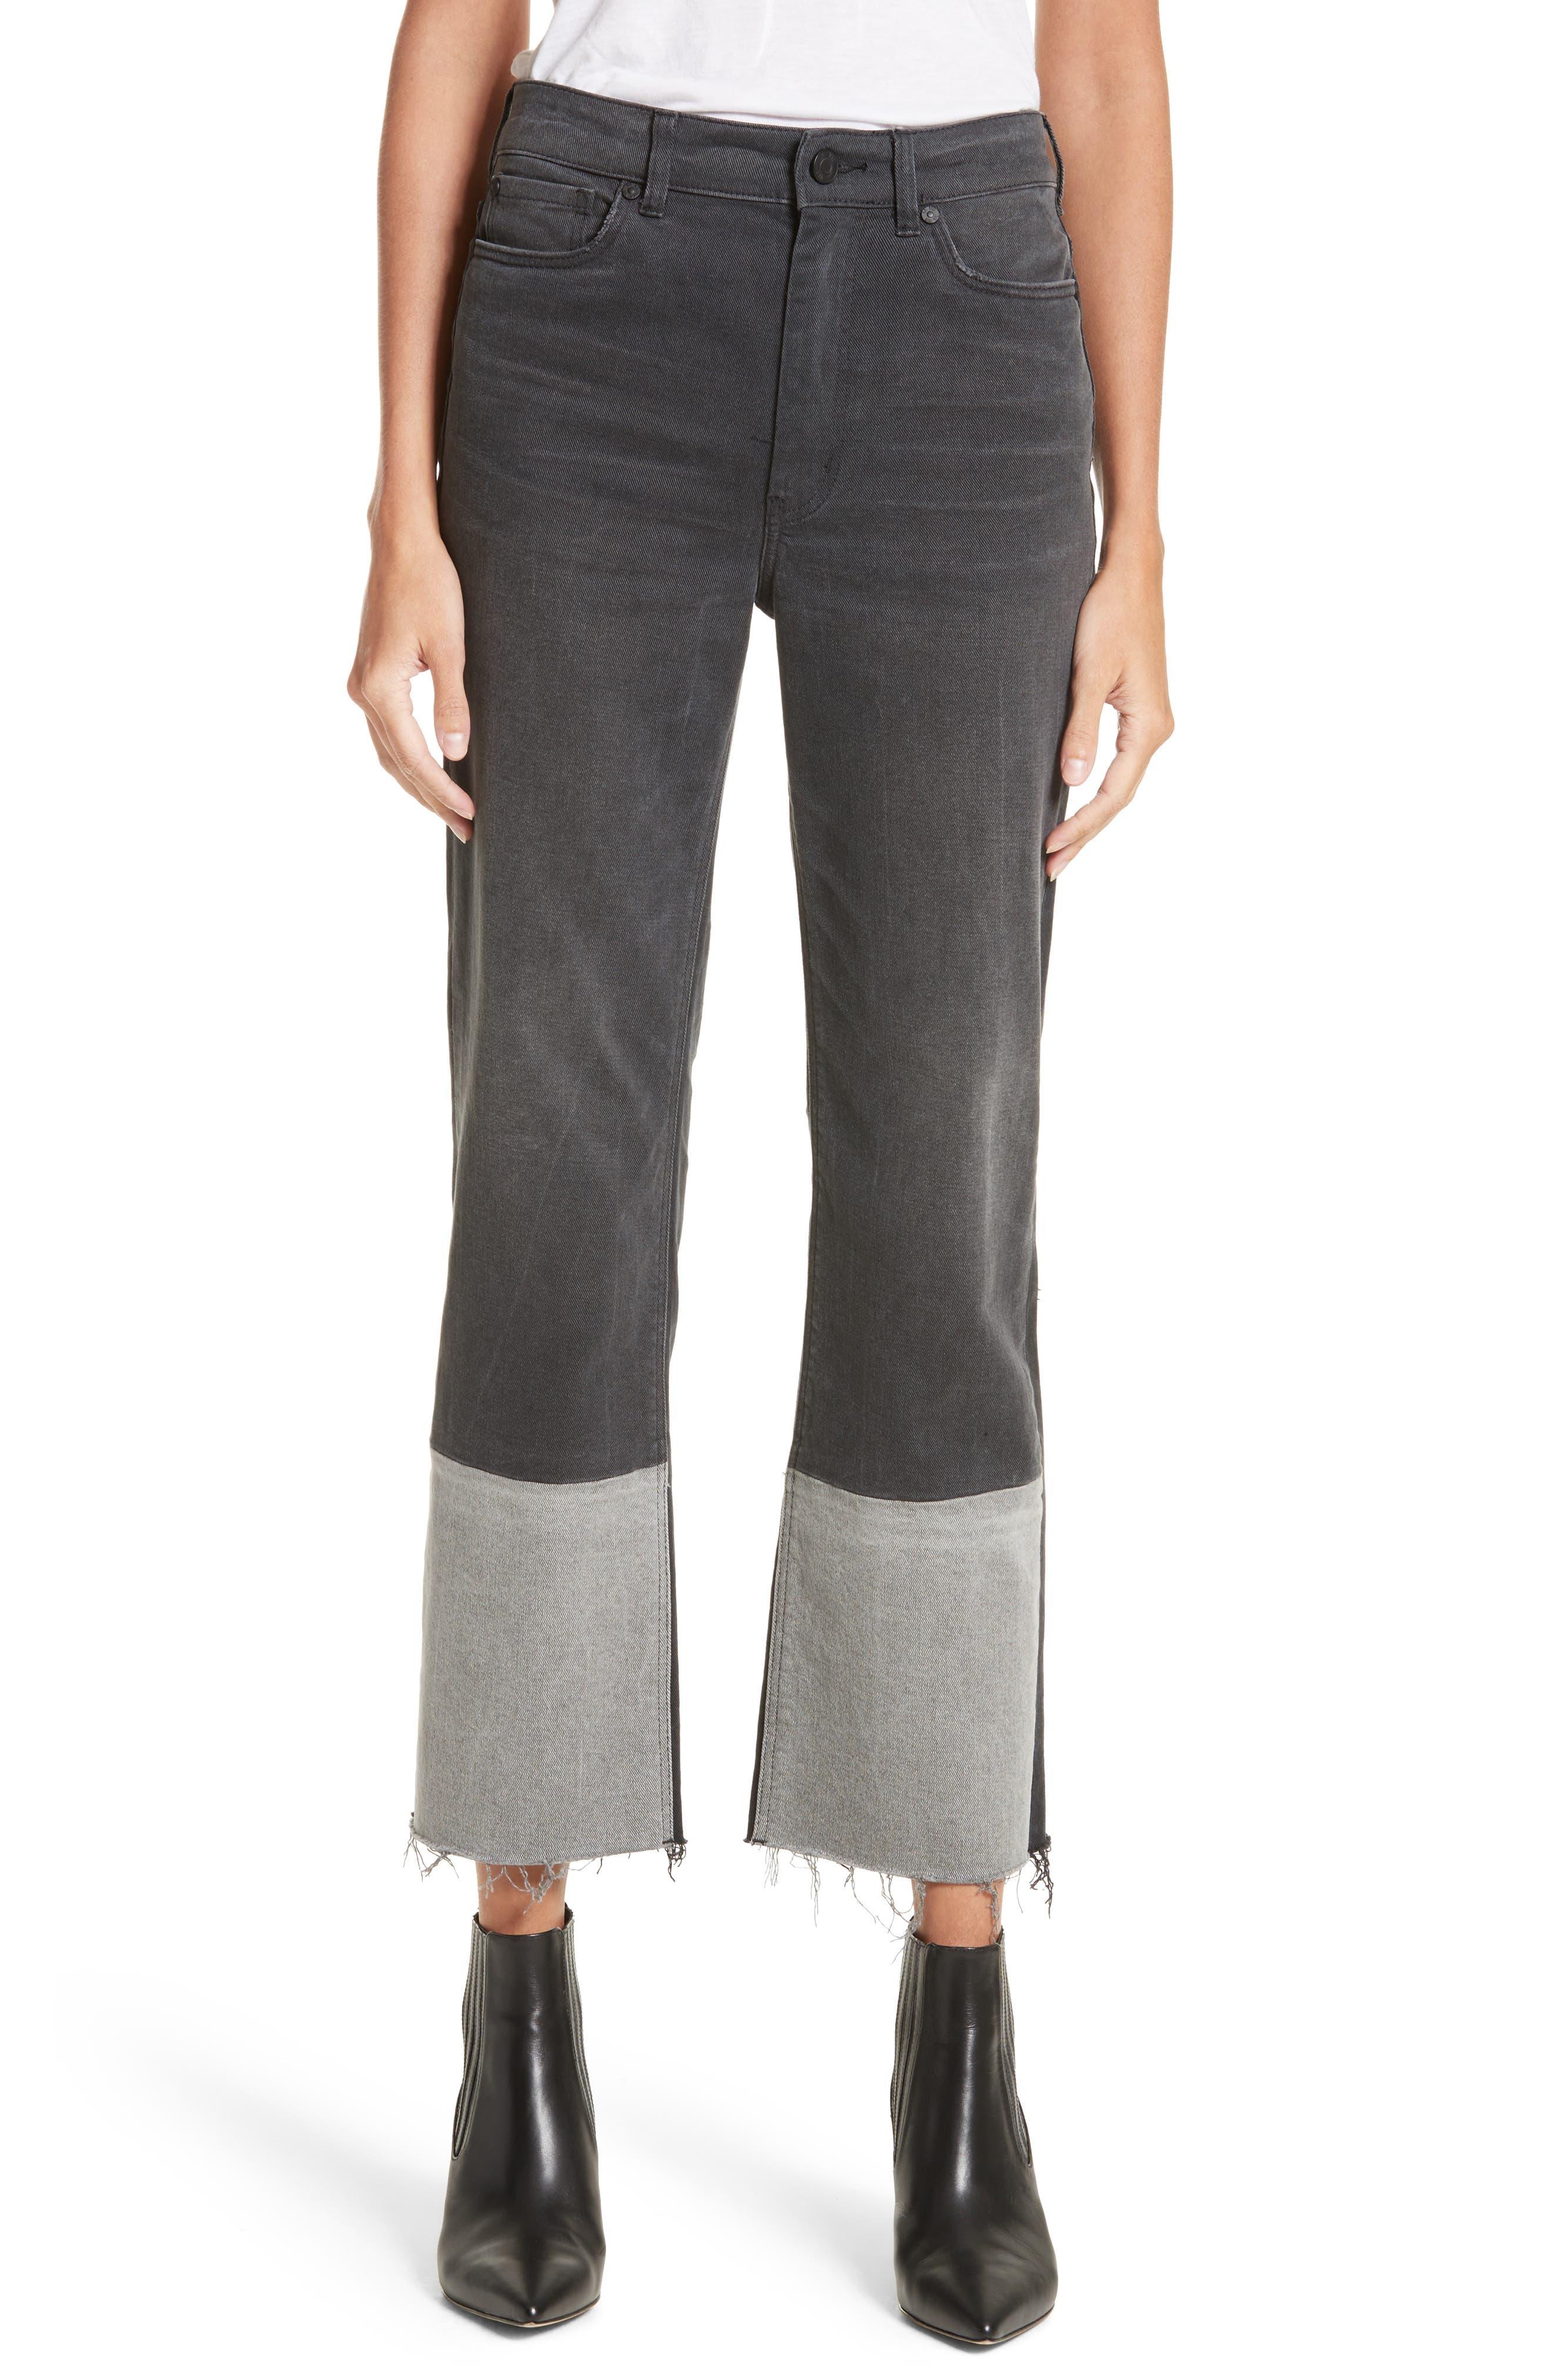 Alternate Image 1 Selected - La Vie Rebecca Taylor Patch Jeans